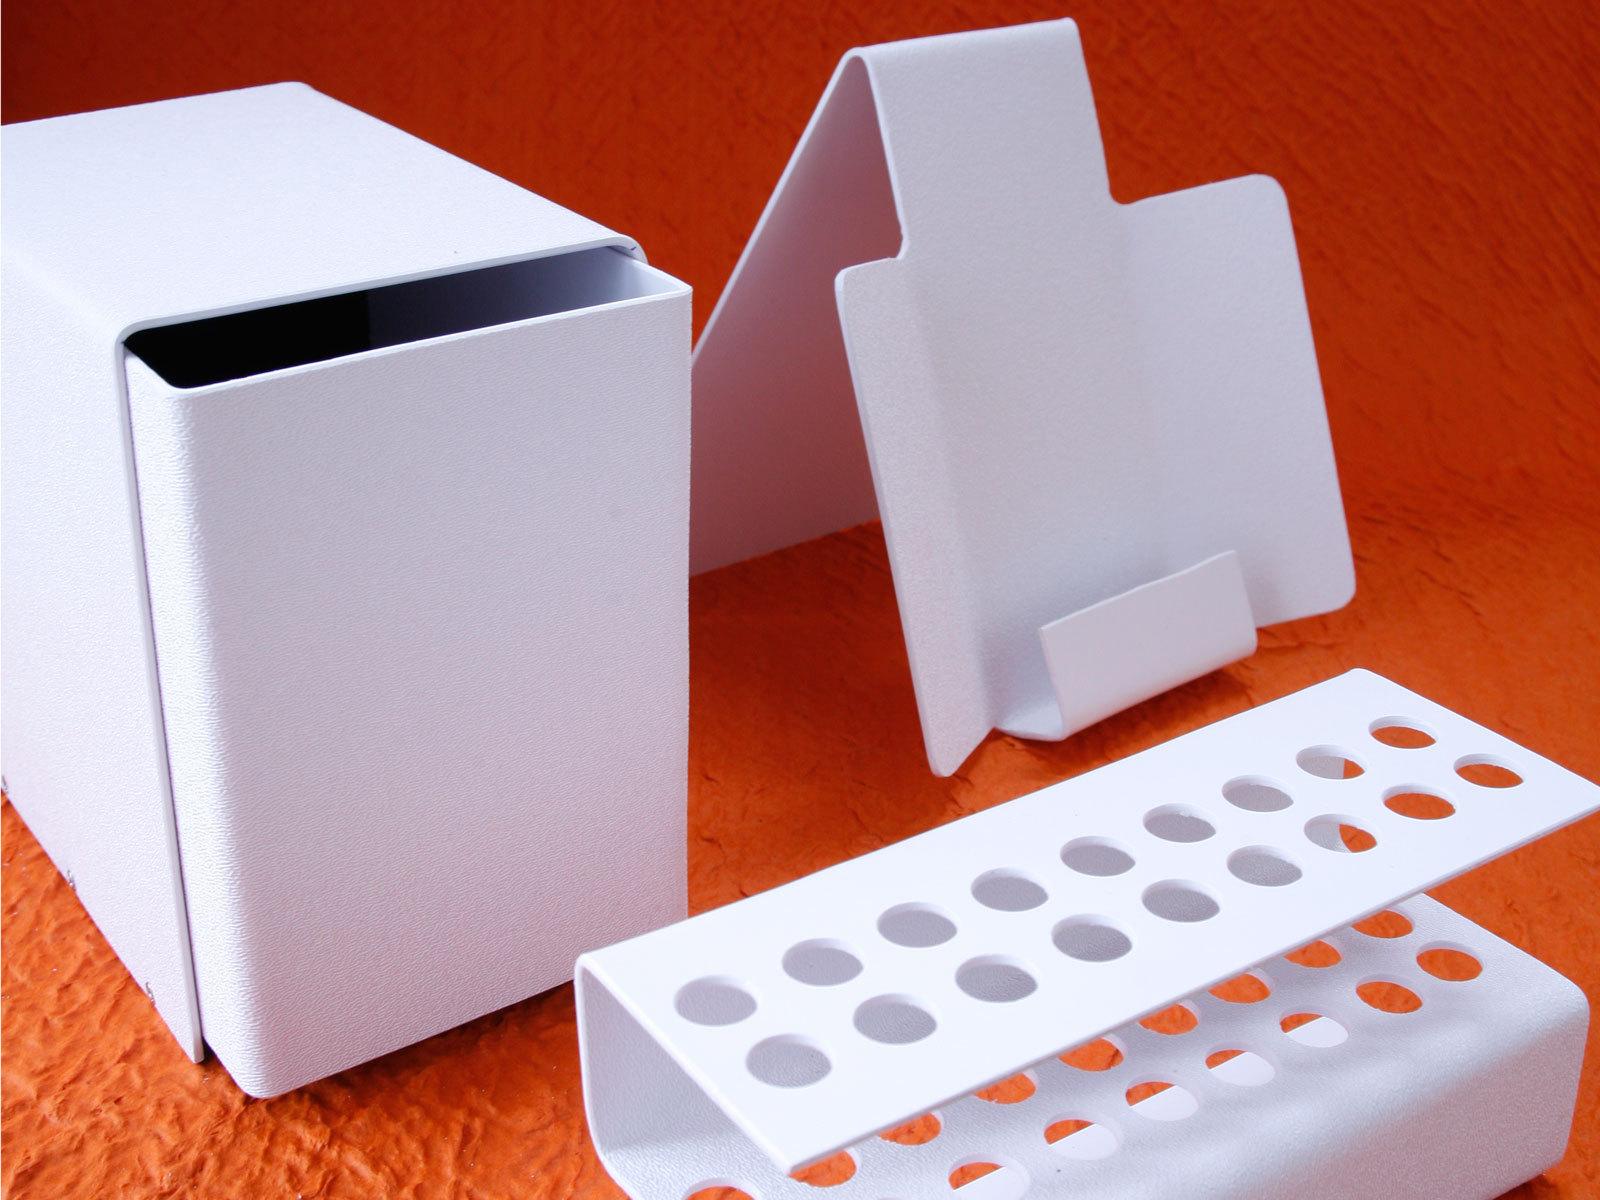 New Project: ABS Plastic Fantastic DeskSet